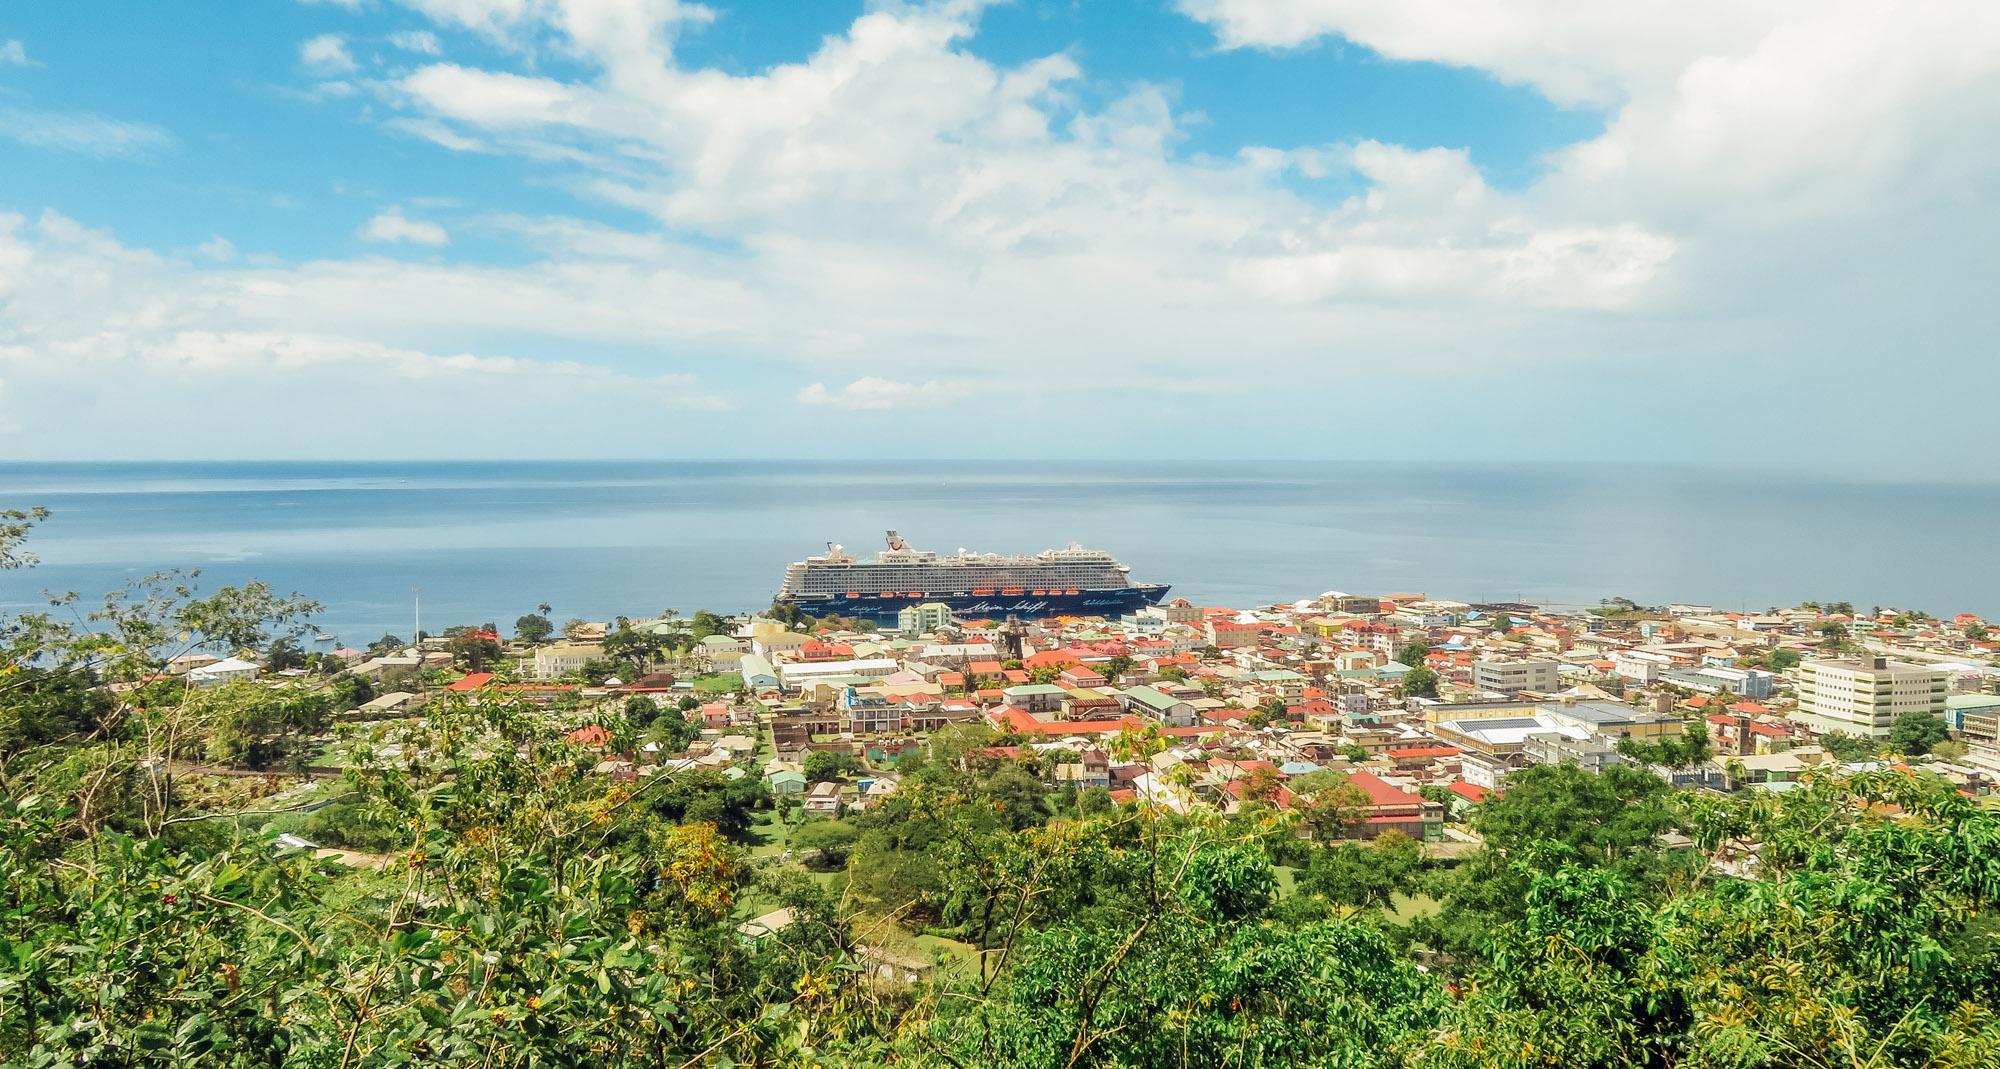 Dominica Karibik Kreuzfahrt Roseau Morne Bruce